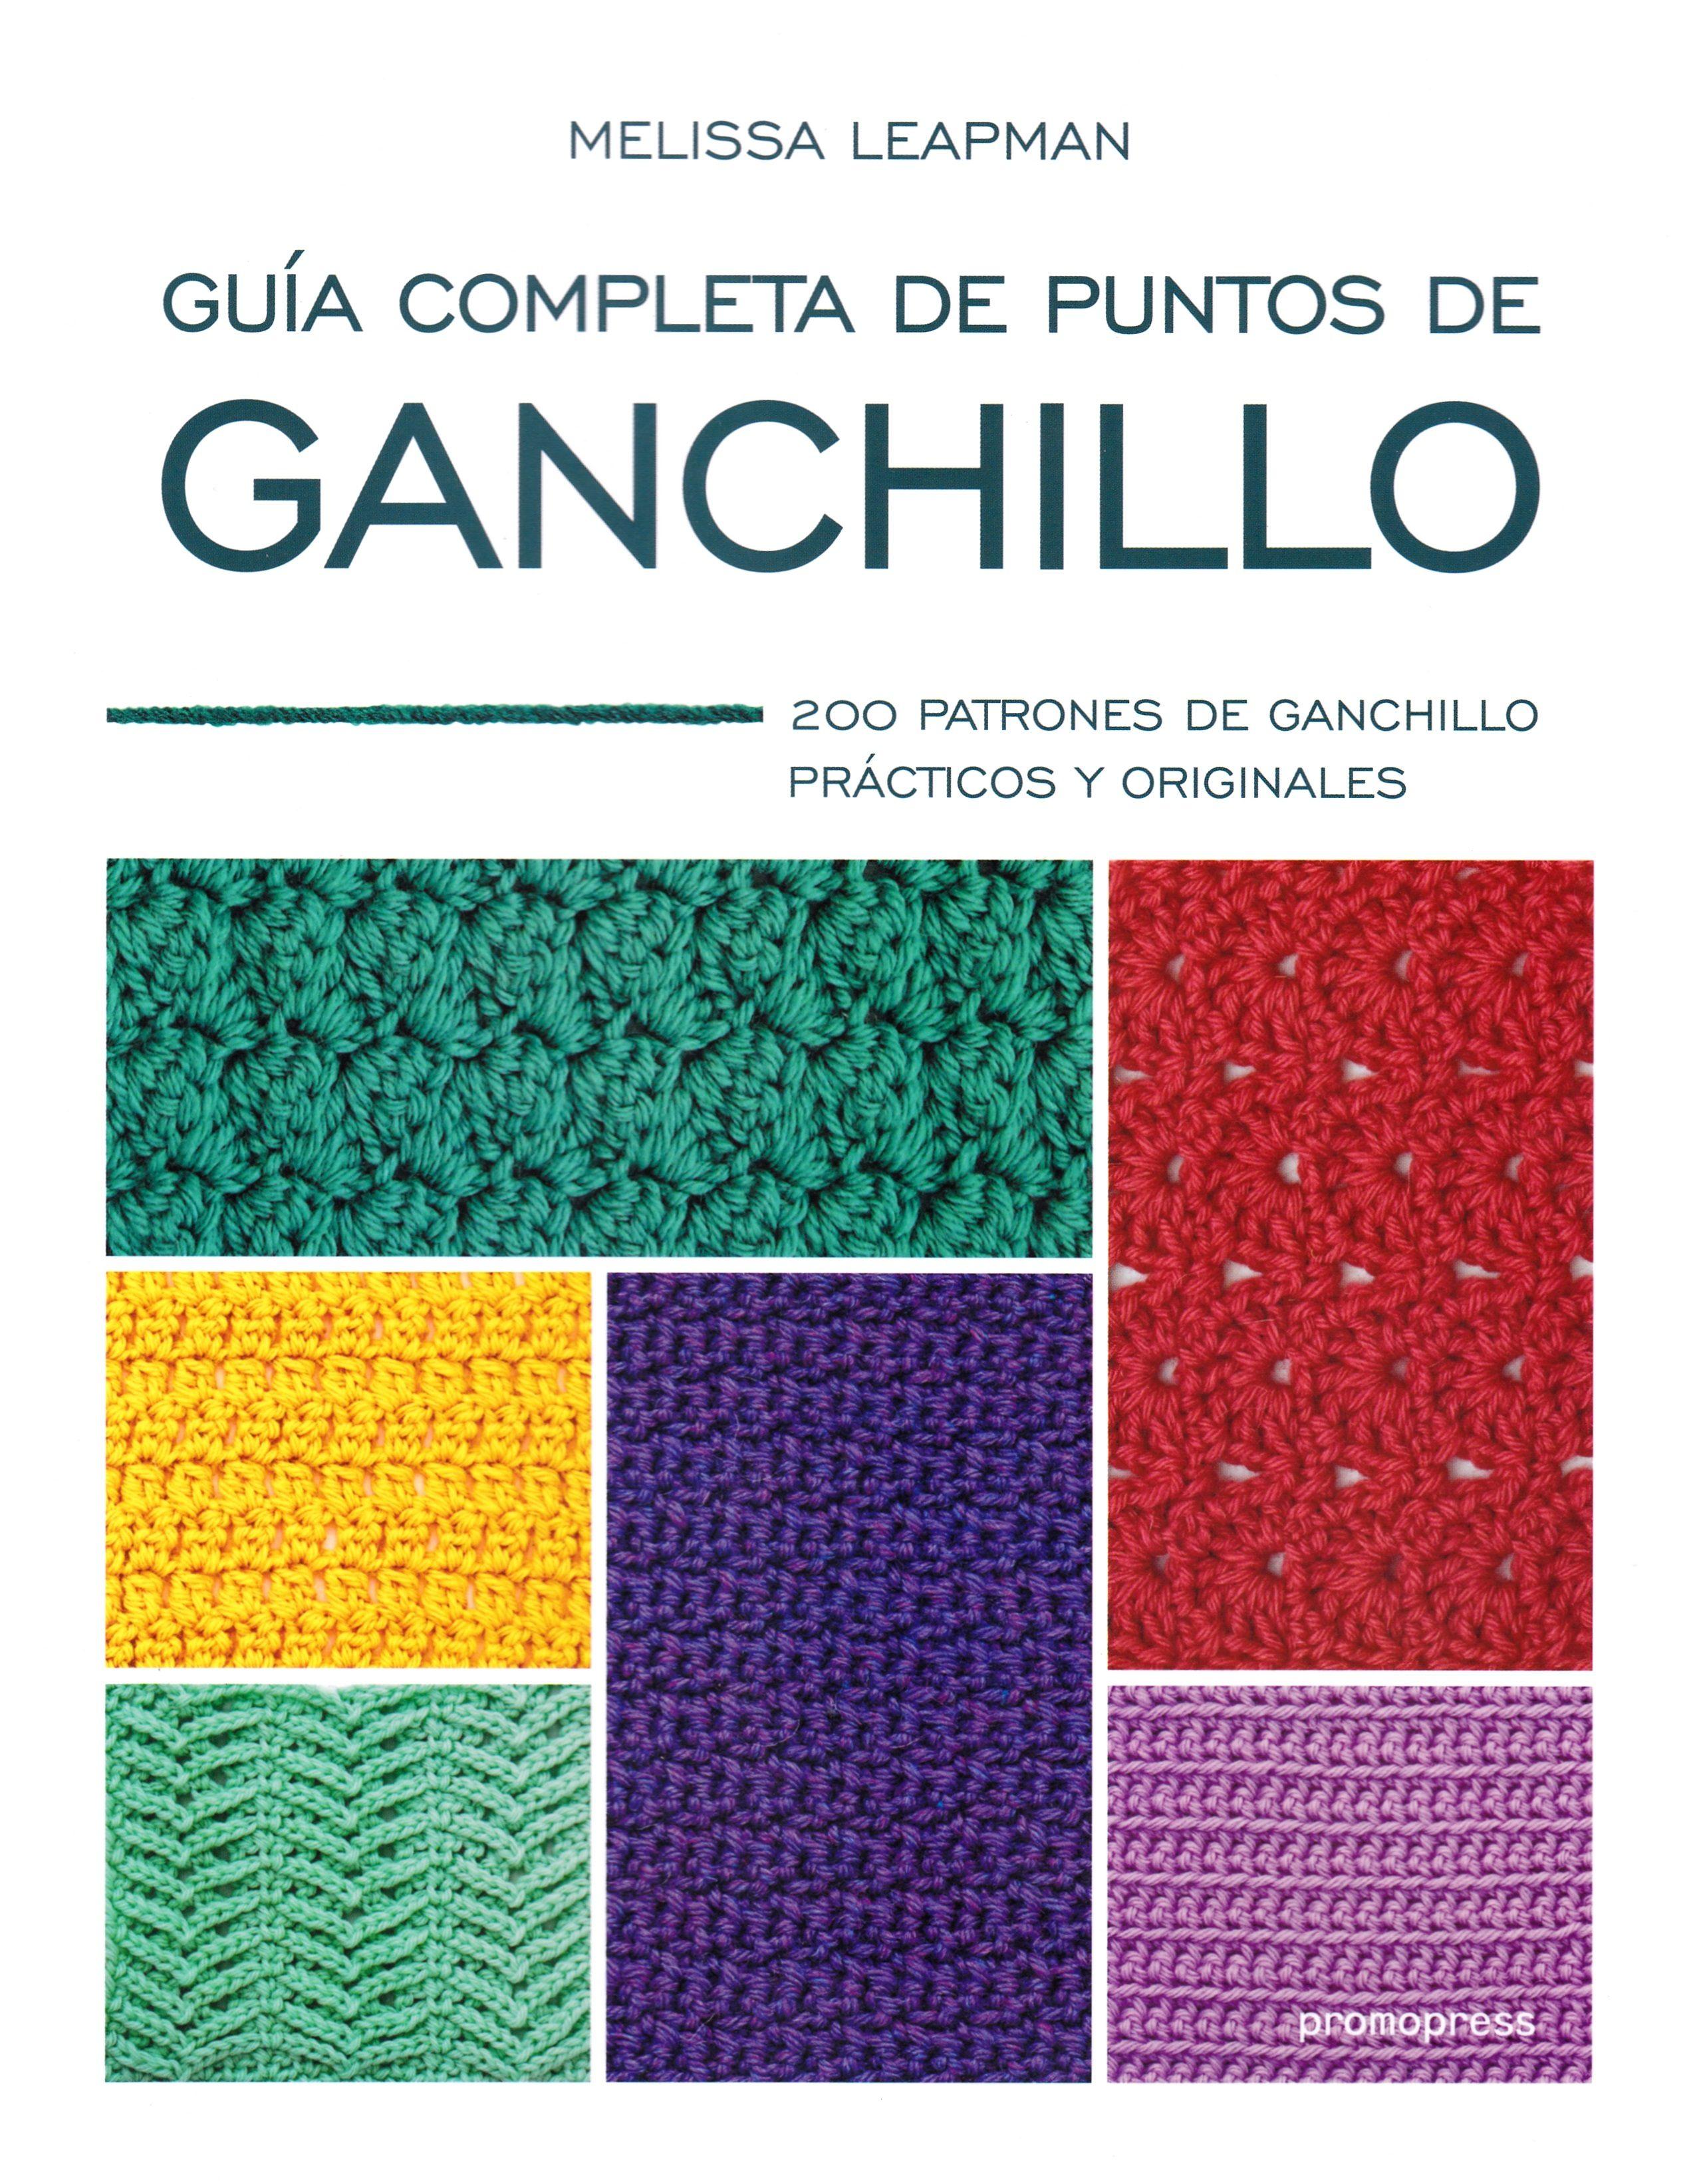 GUIA COMPLETA DE PUNTOS DE GANCHILLO: 200 PATRONES DE GANCHILLO ...